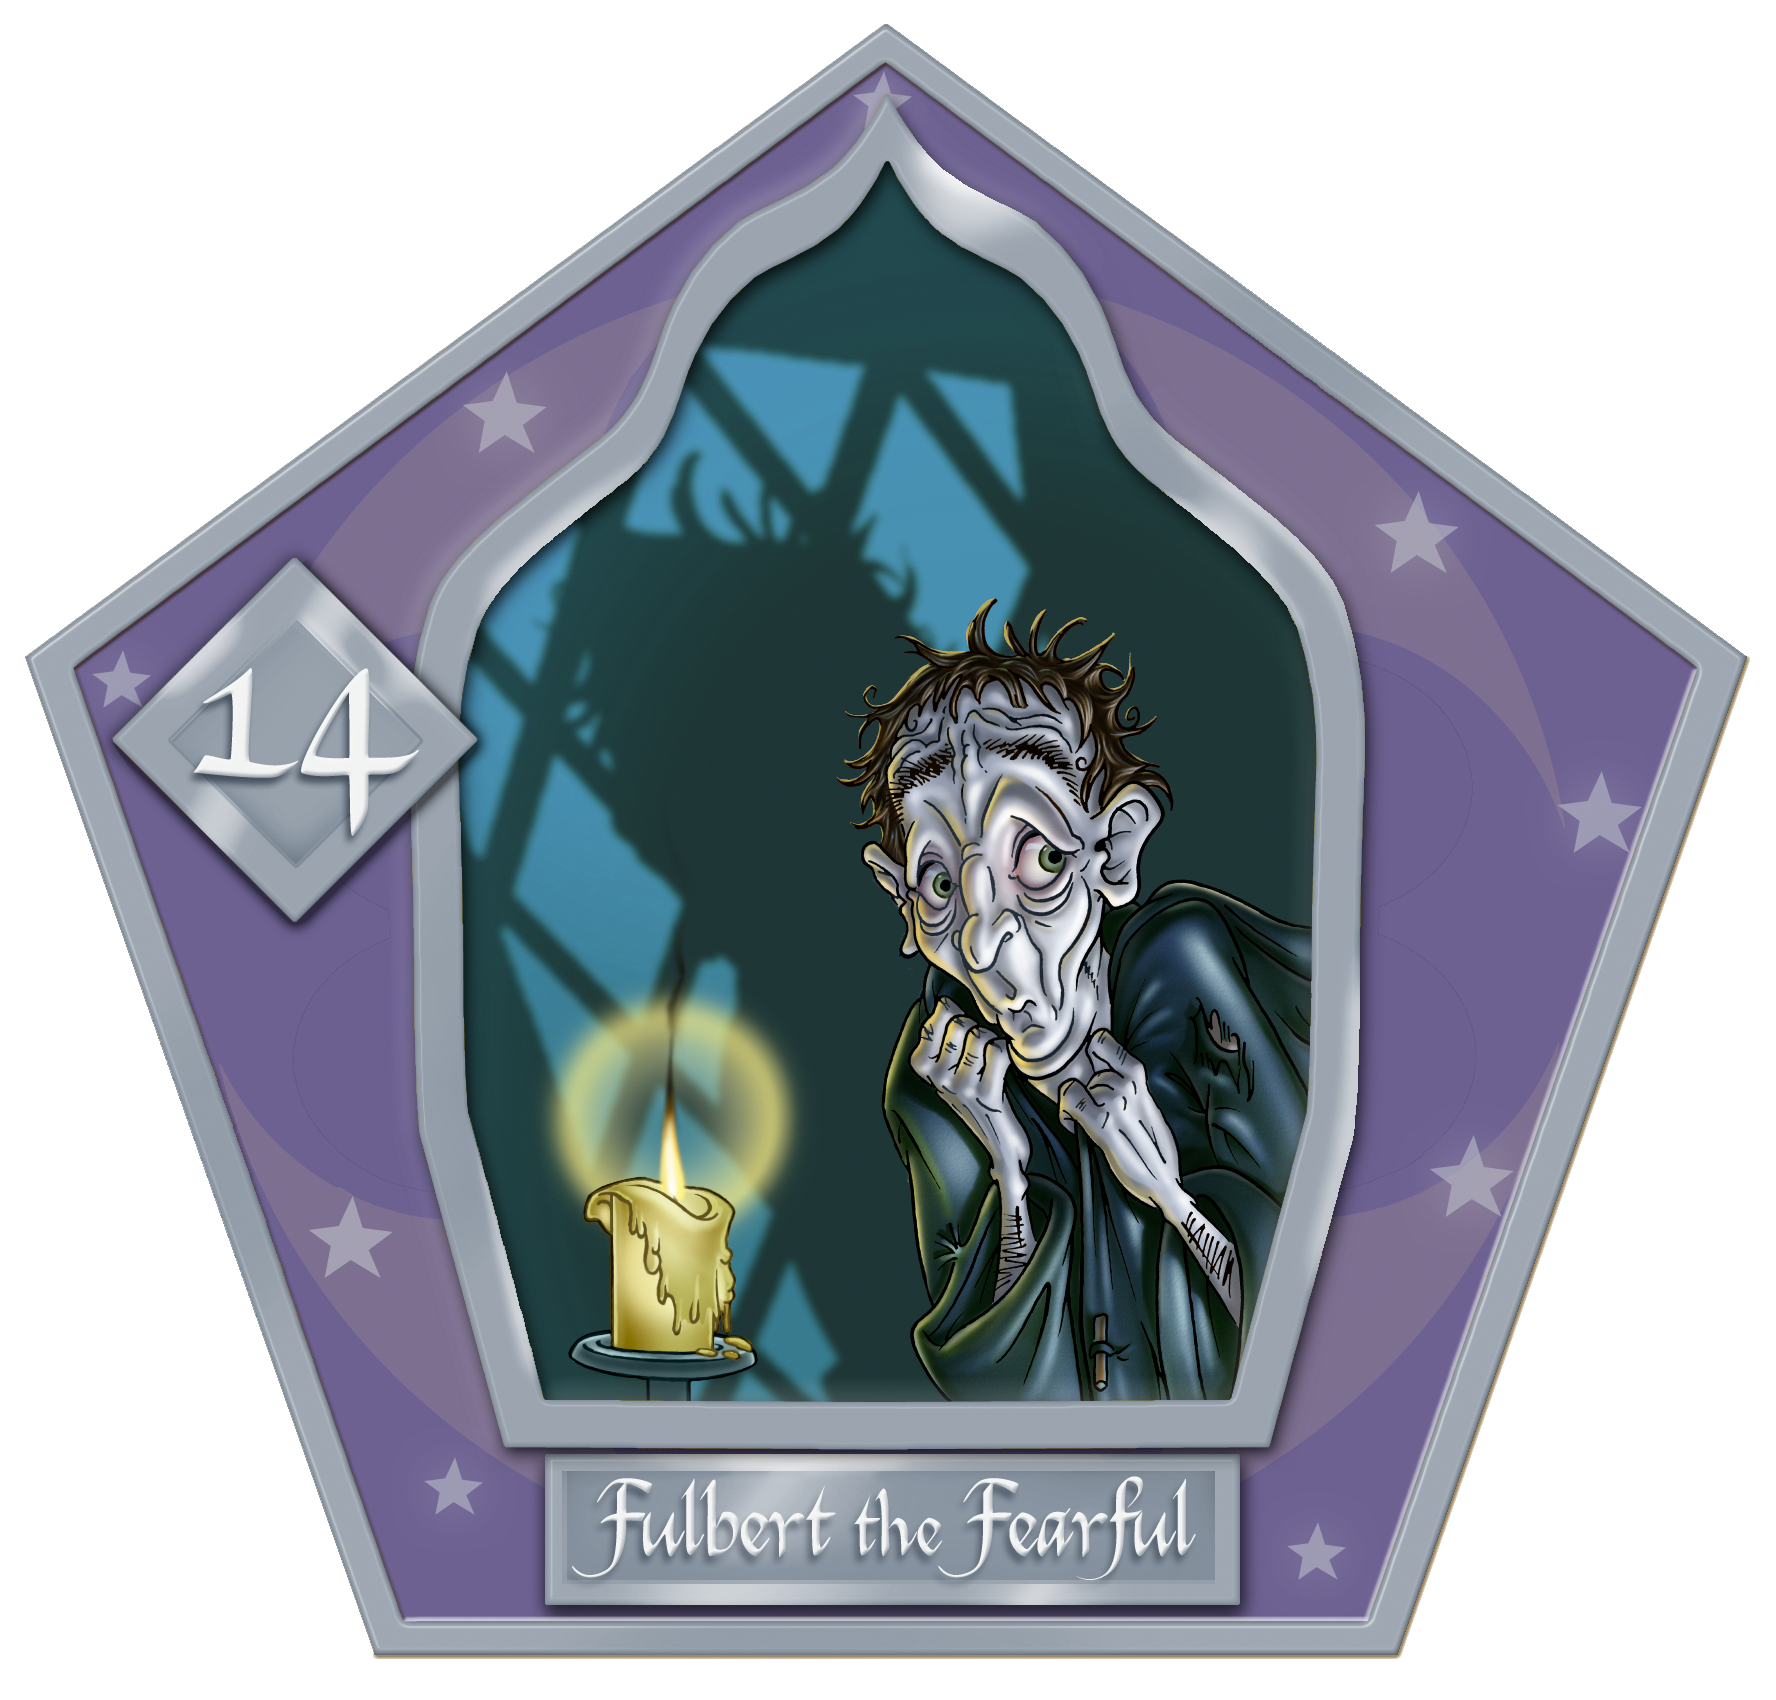 File:Fulbert The Fearful-14-chocFrogCard.png